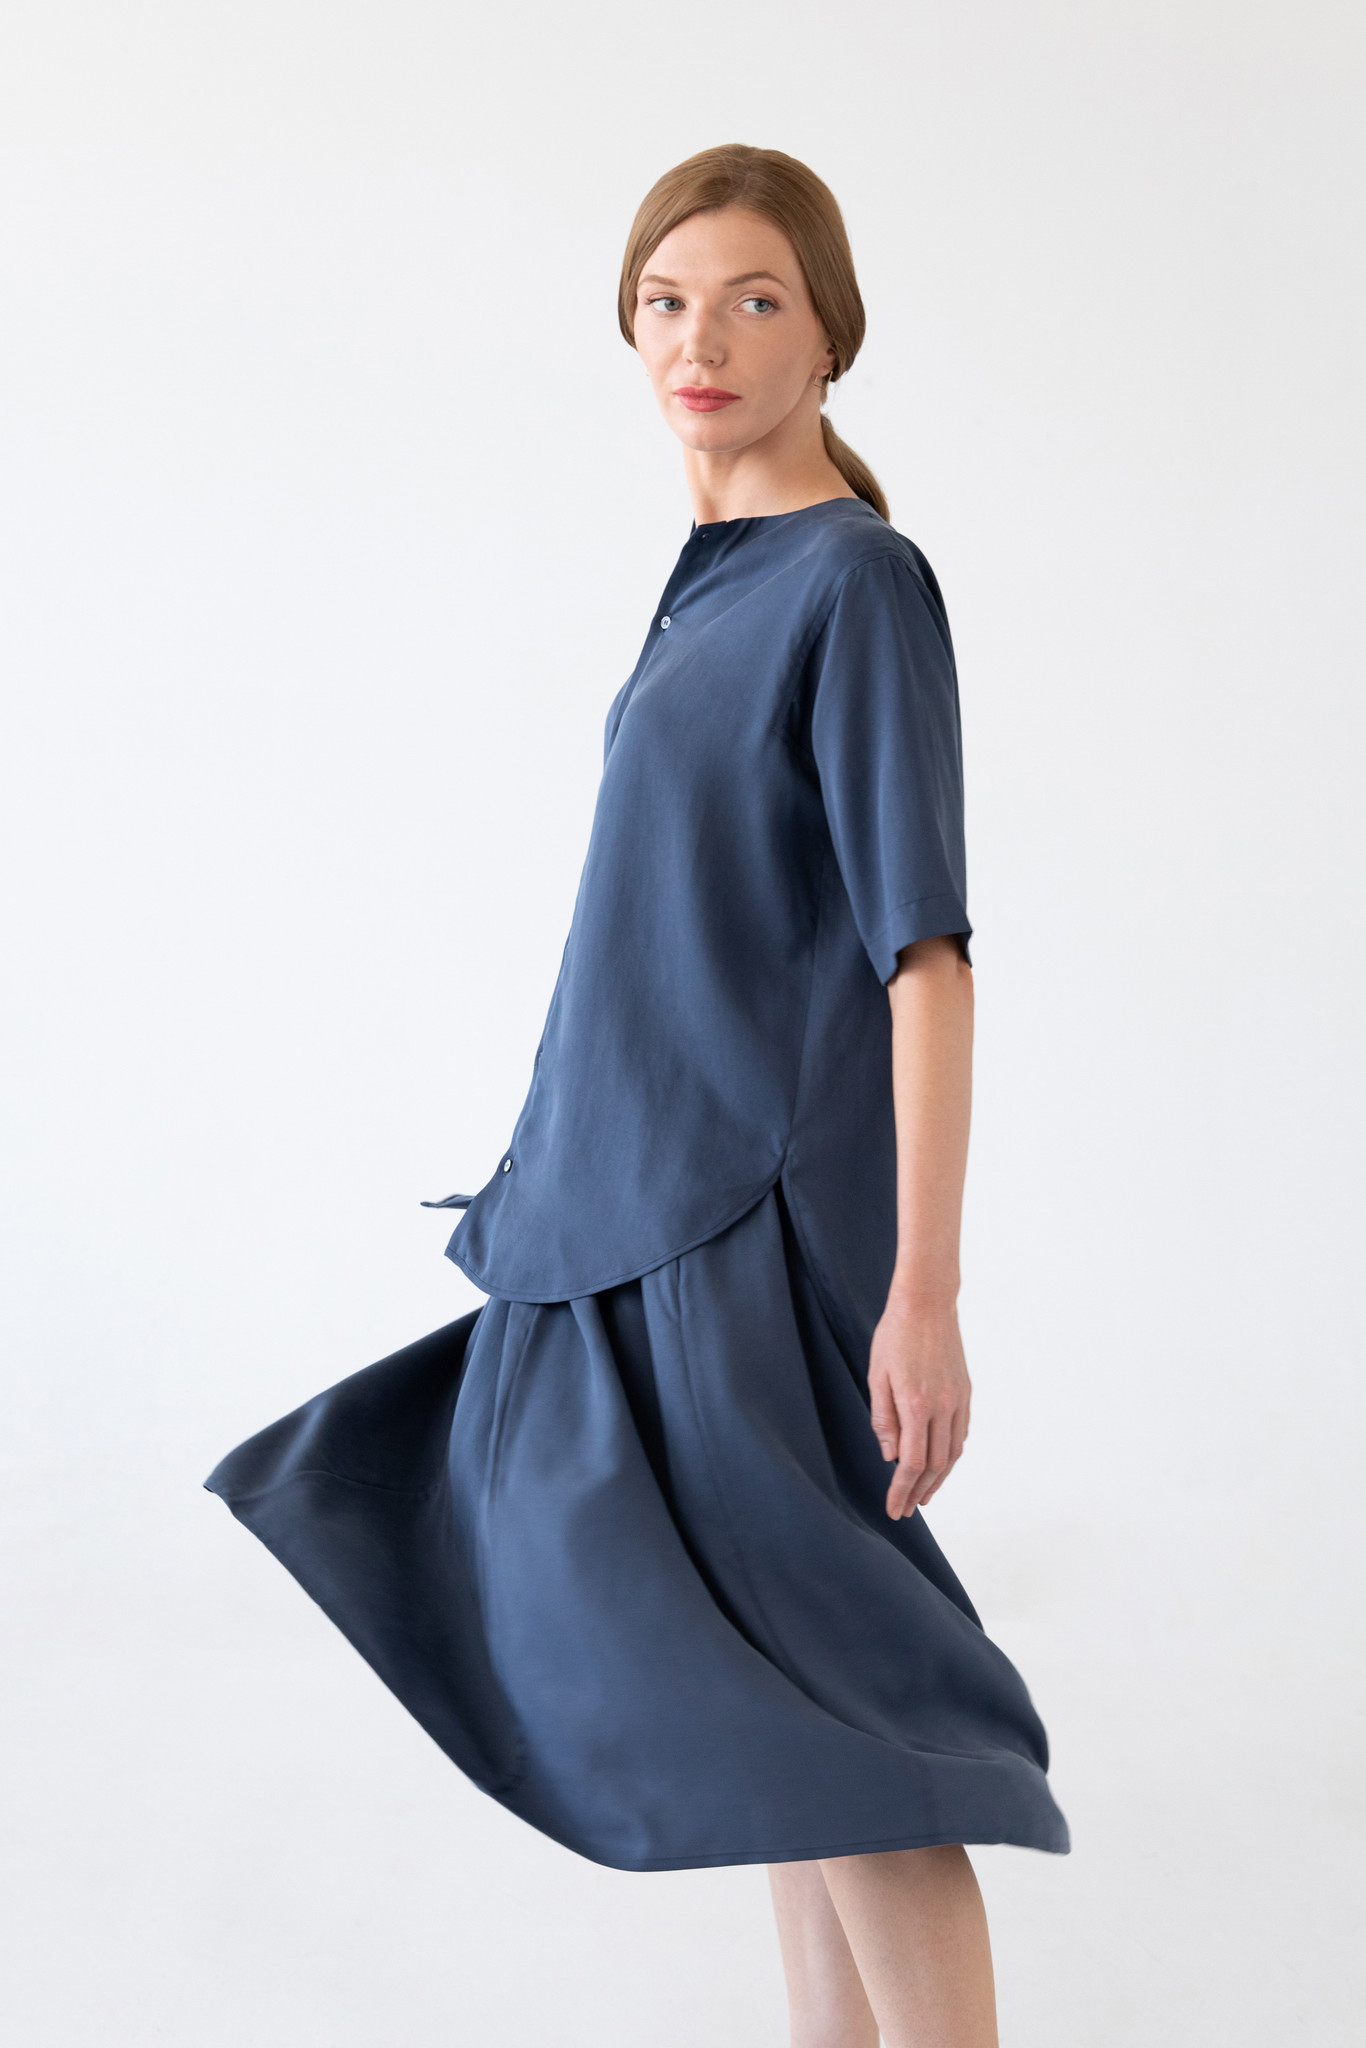 Bluse mit kurzem Arm aus Tencel - Blau-4